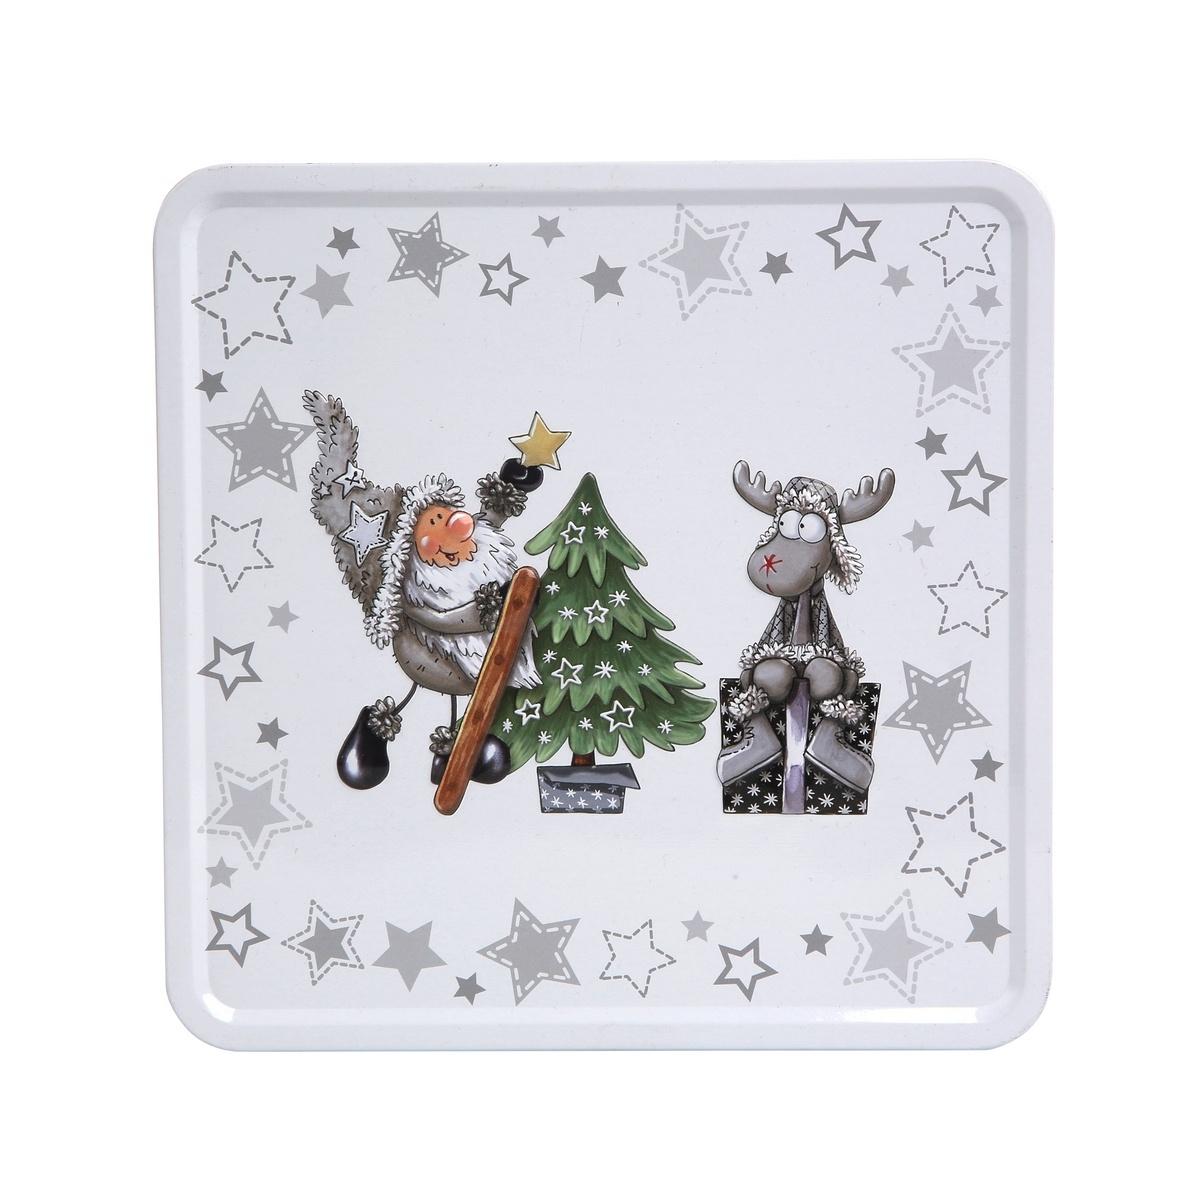 Altom Plechová dóza s víkem X-Mas Santa with reindeer and tree, 20 x 20 x 8 cm